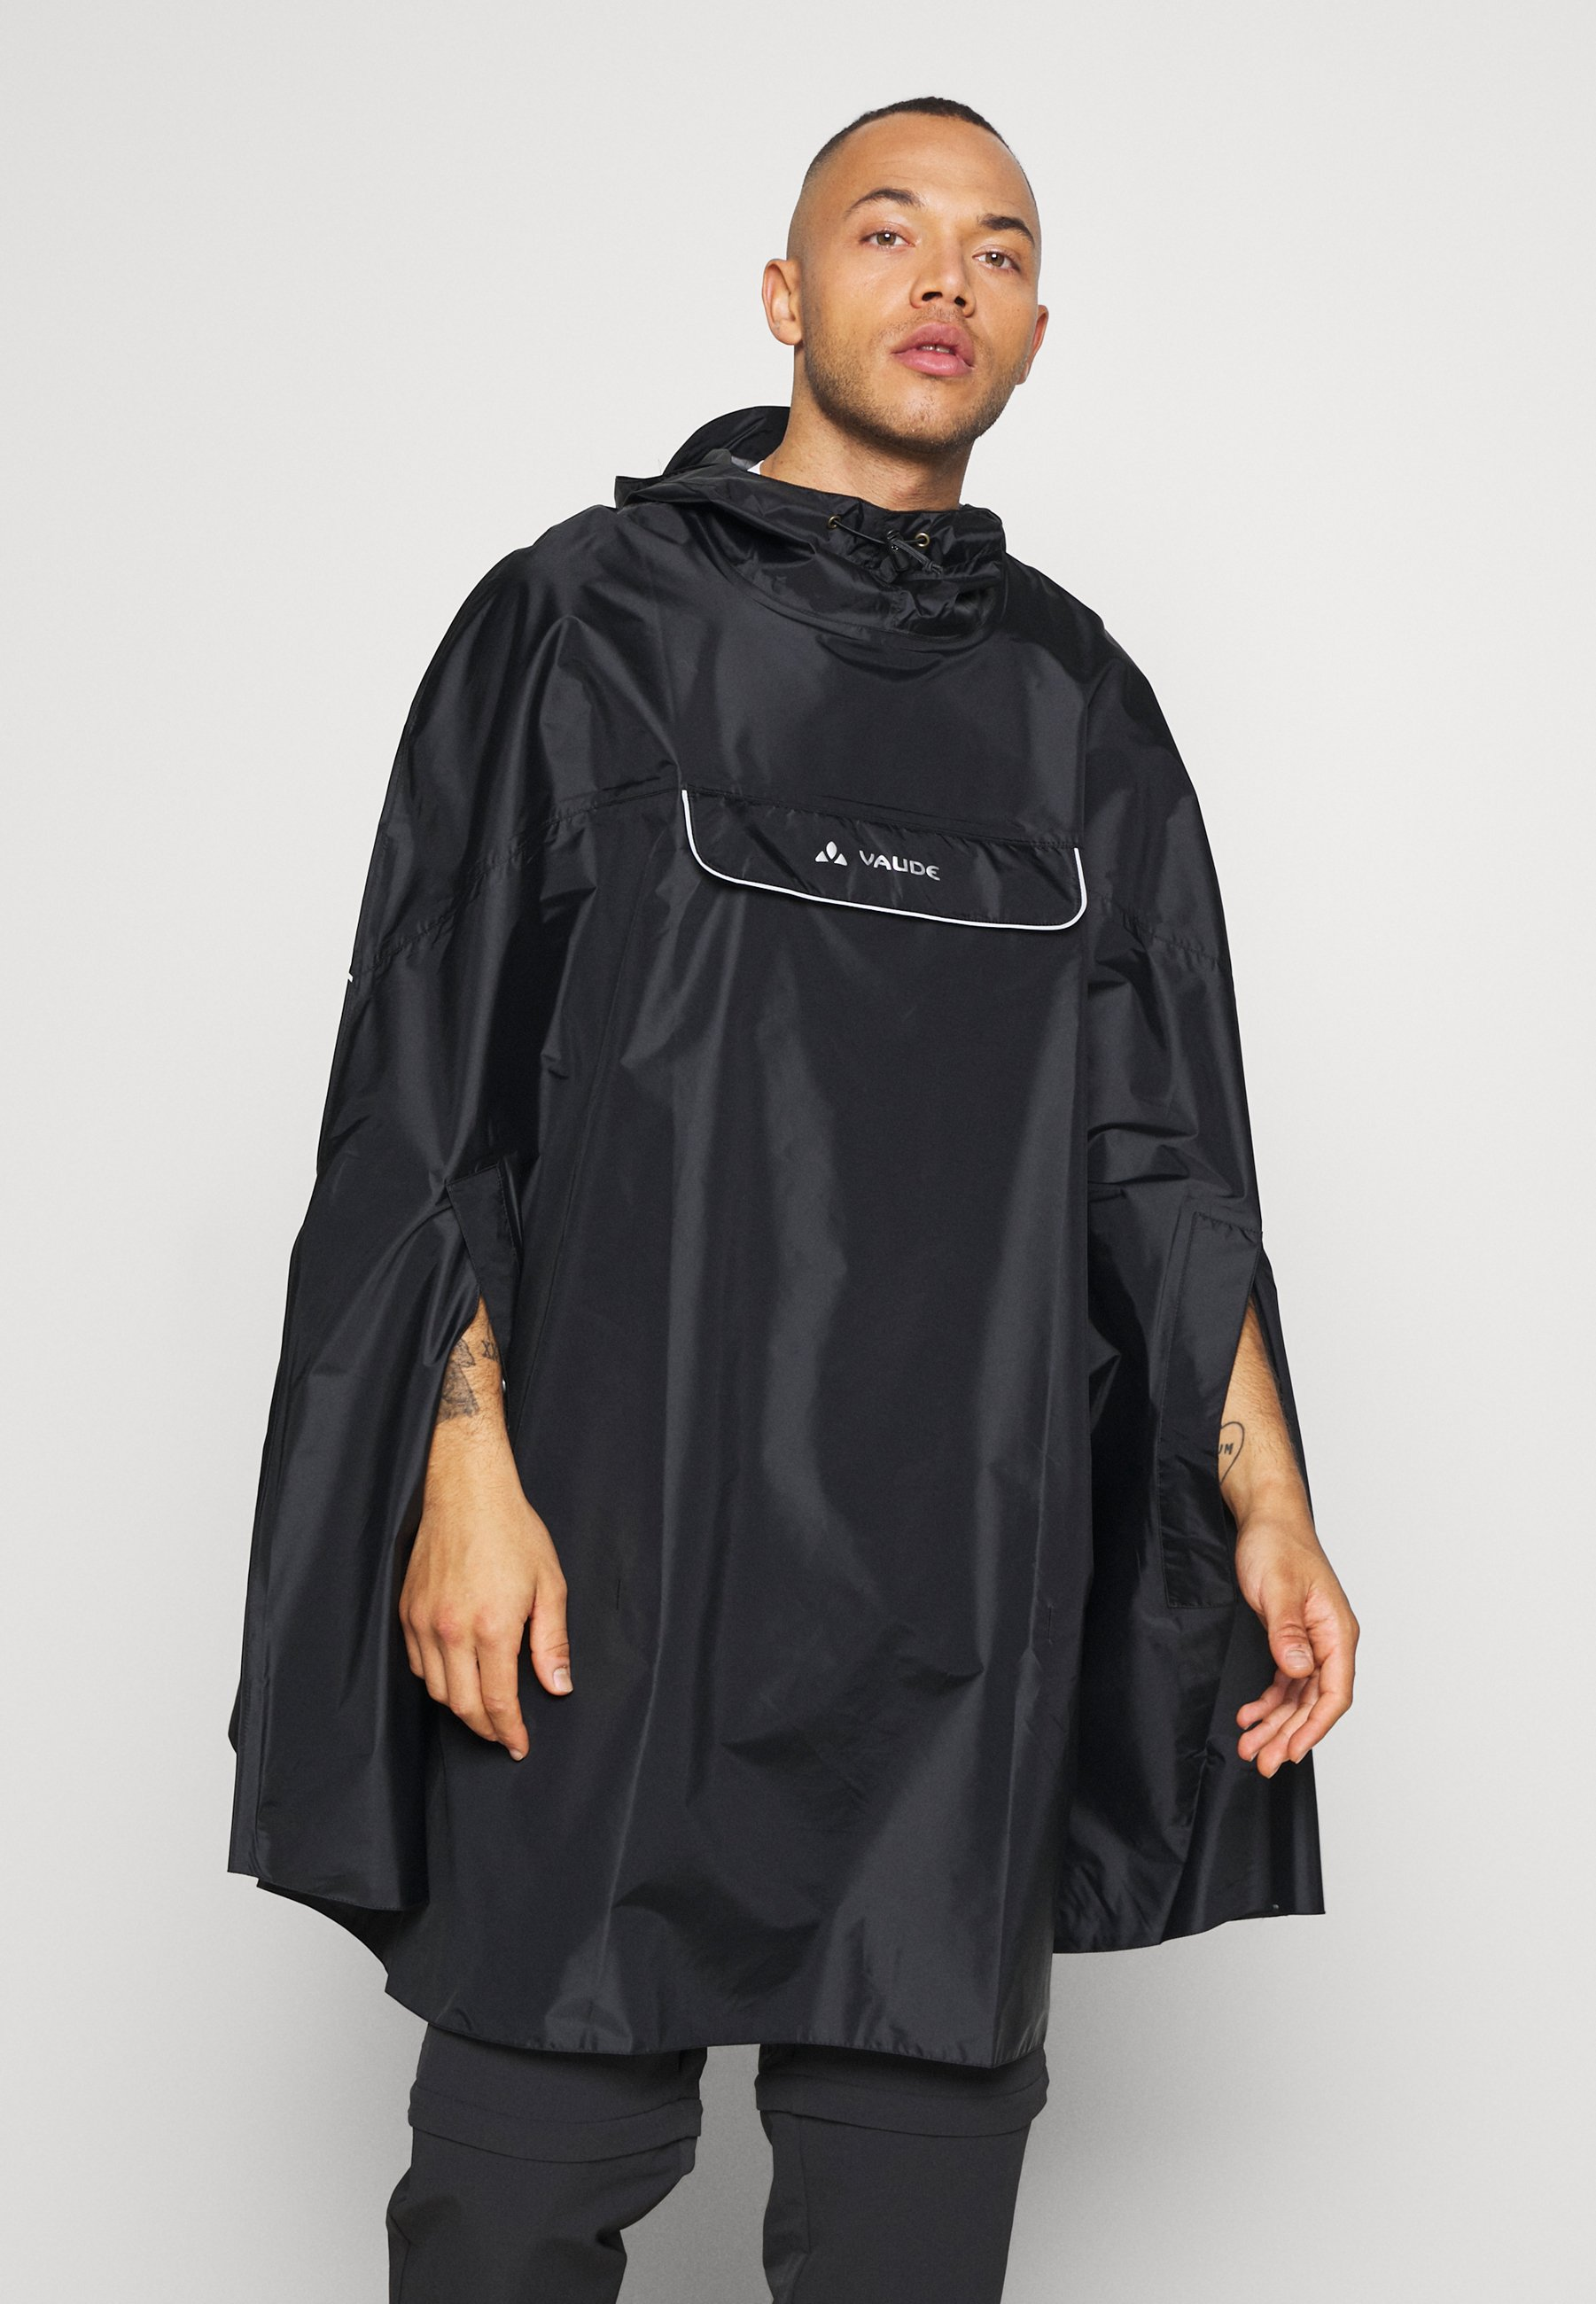 Herren VALDIPINO PONCHO - Regenjacke / wasserabweisende Jacke